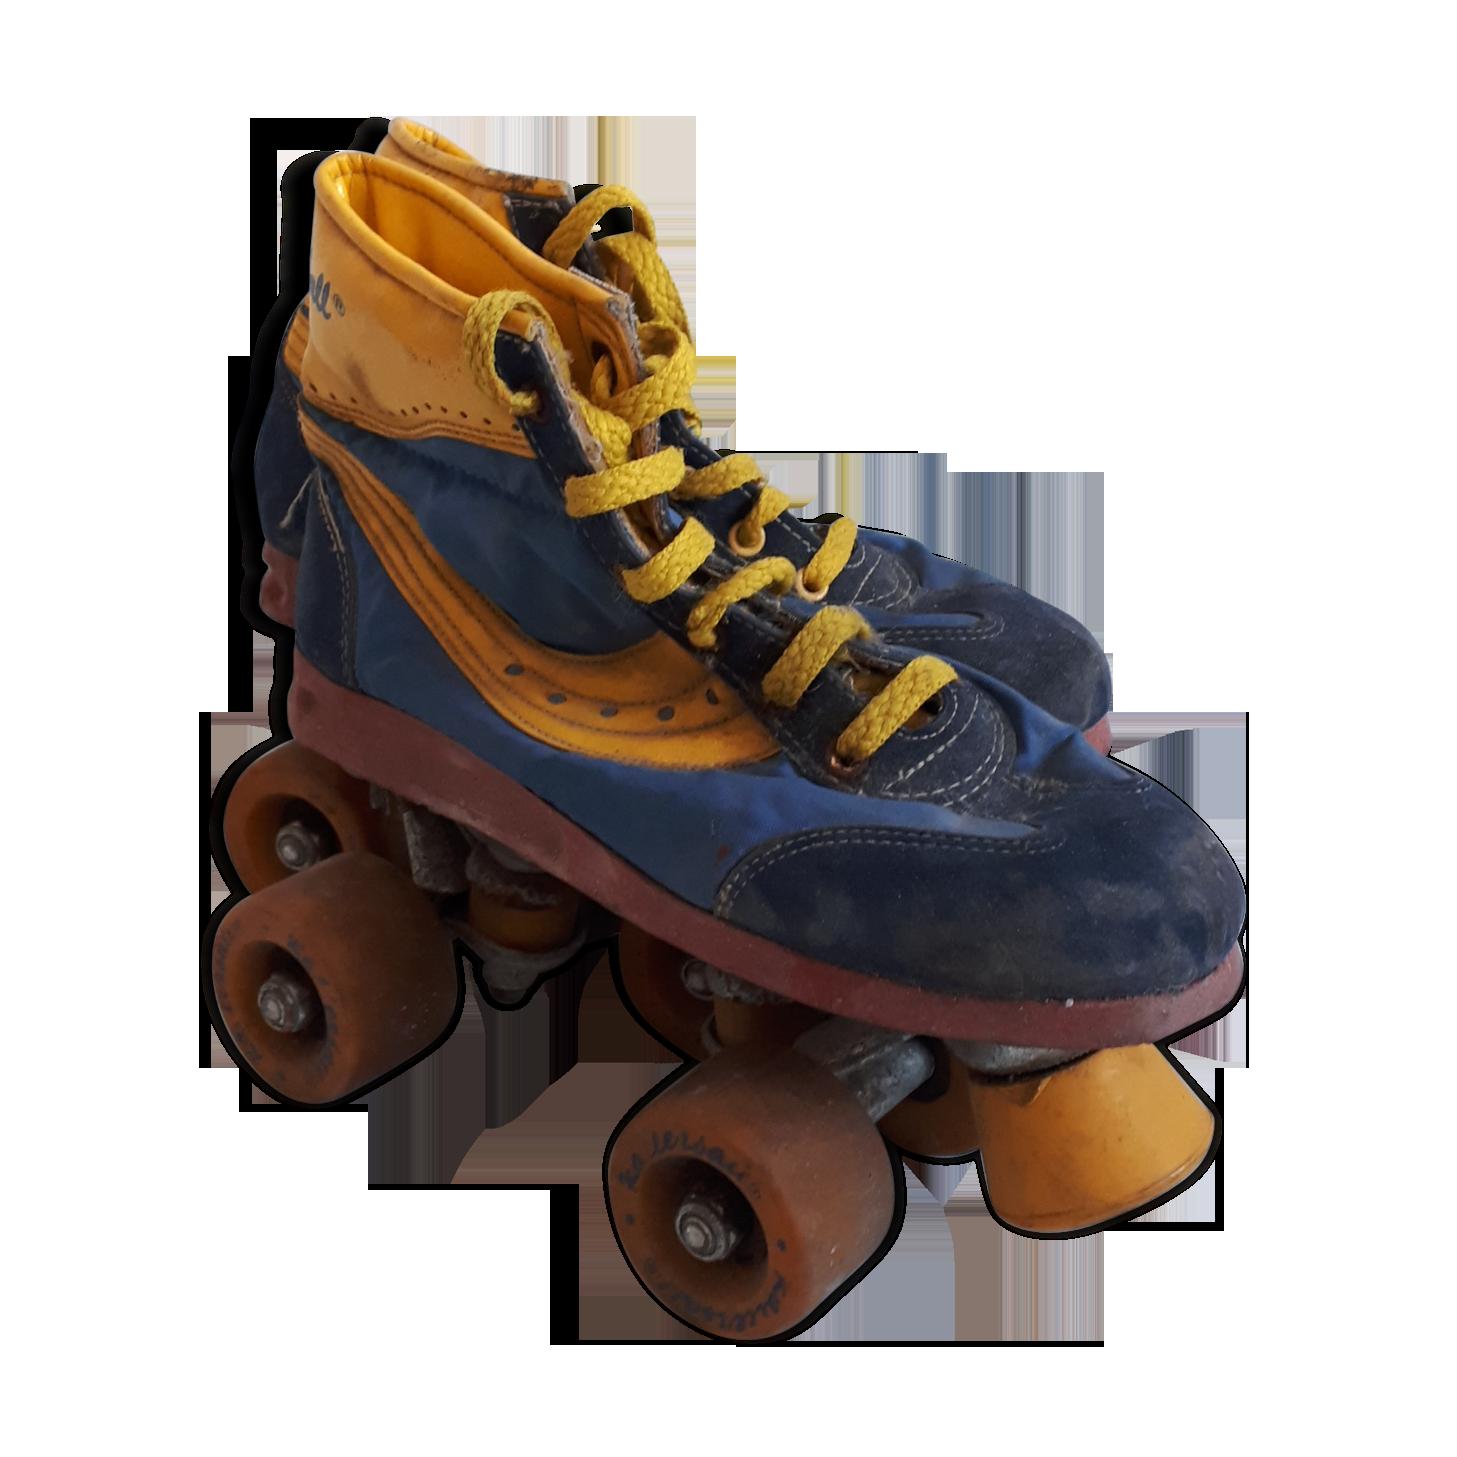 Meubles Autocollant Vintage Image Transfer Roller Skate restaurer Shabby Chic Antique